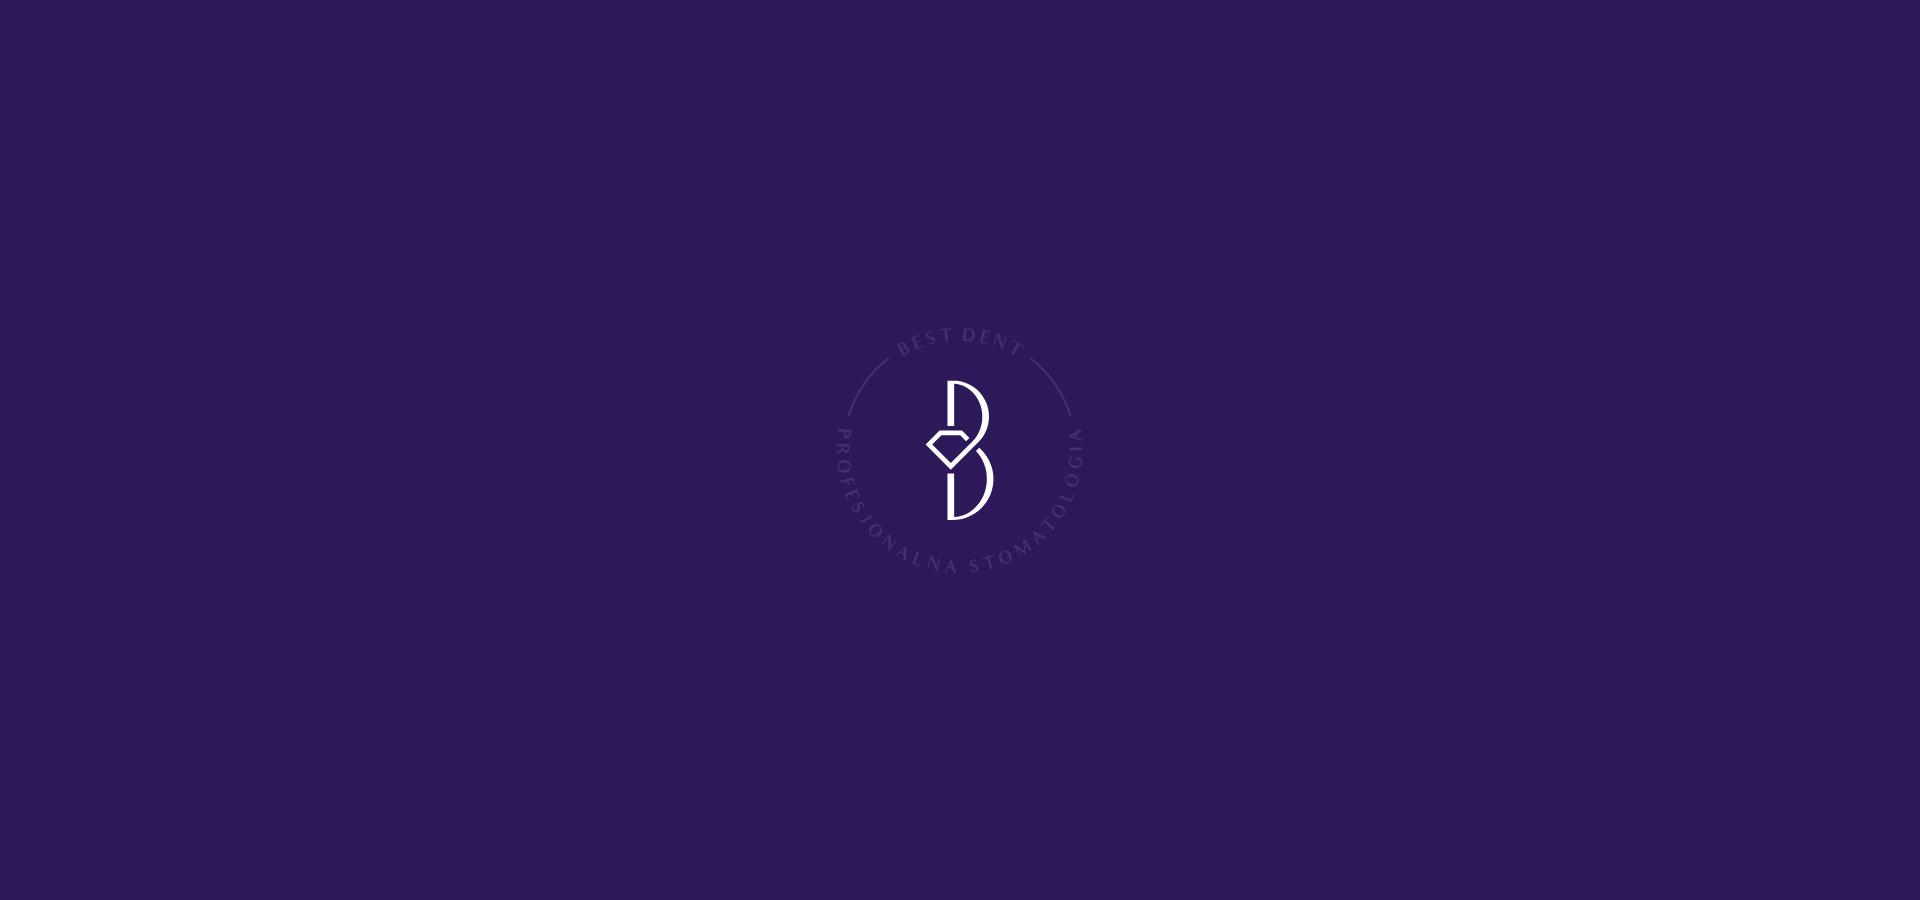 Dominik-Pacholczyk-Logo-Design-Collection-18